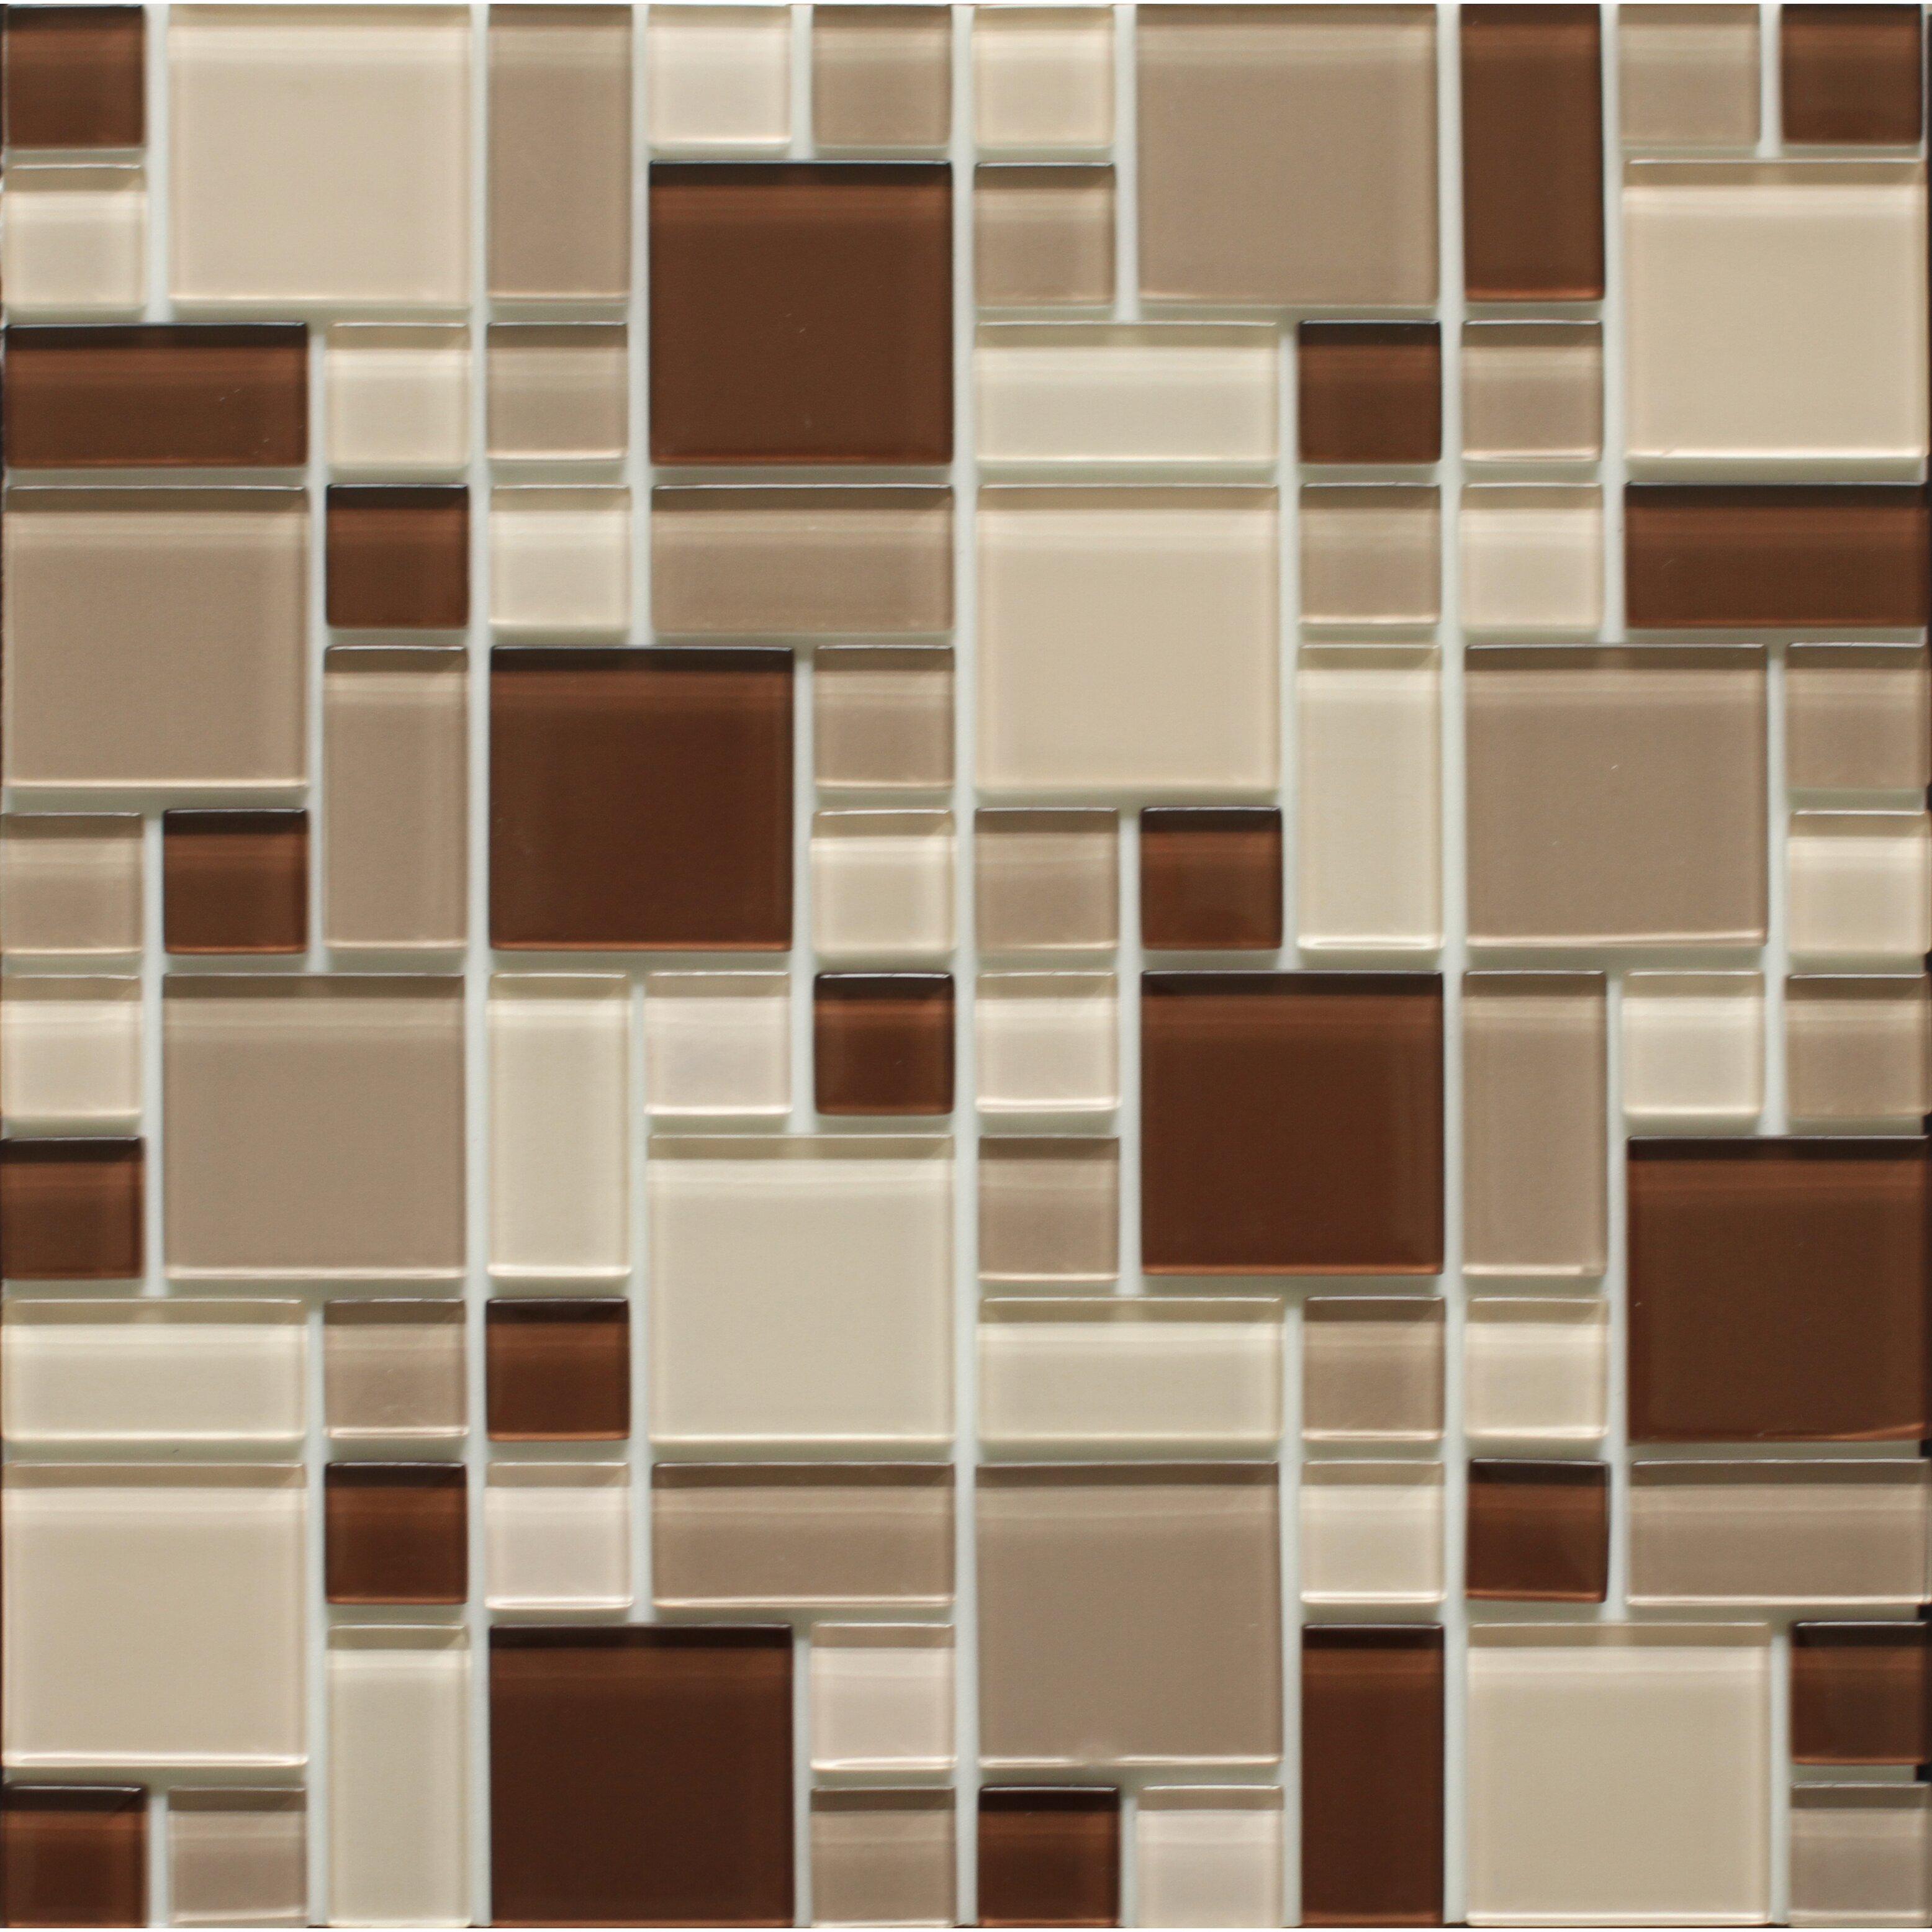 instant mosaic 12 39 39 x 12 39 39 glass peel stick mosaic tile in beige brown reviews wayfair. Black Bedroom Furniture Sets. Home Design Ideas